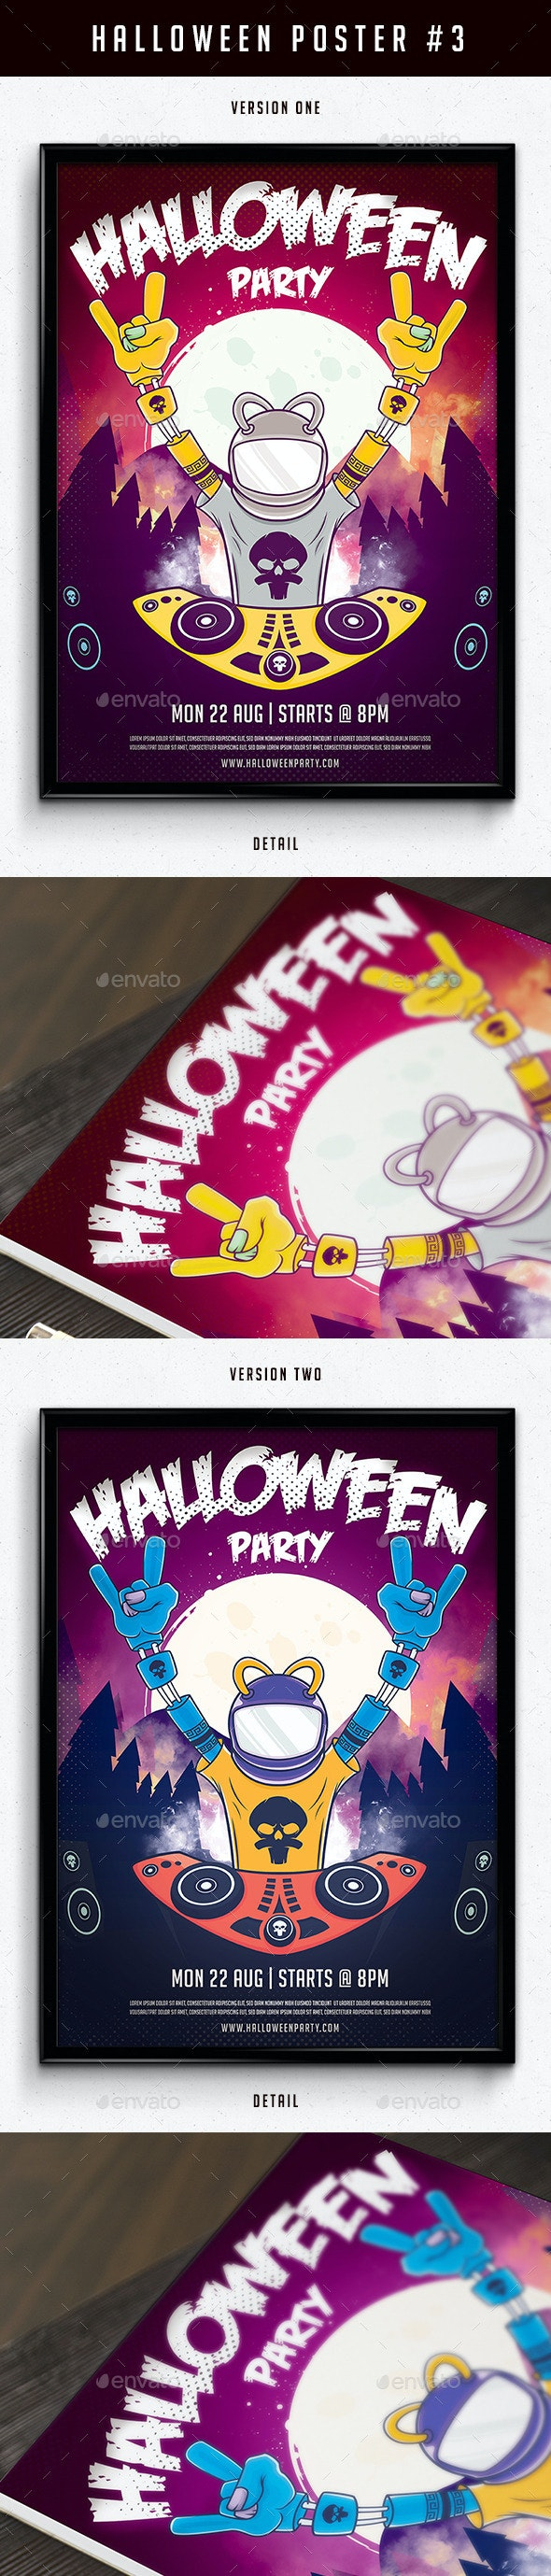 Halloween Poster 3 - Print Templates